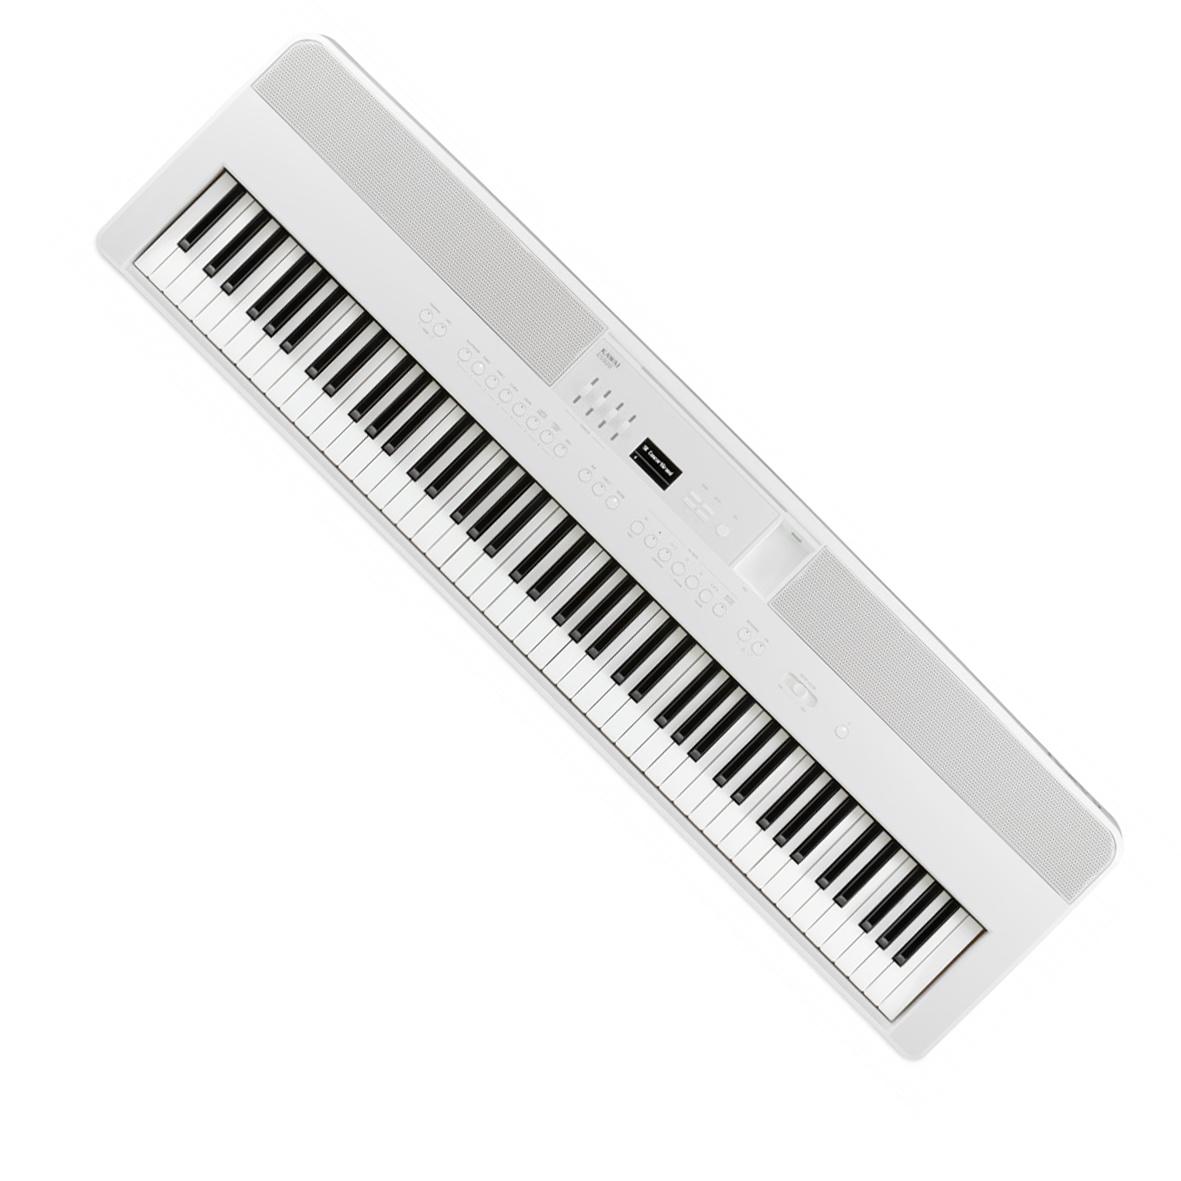 Kawai - Digital und E Piano Kawai ES 920 White Portable Piano